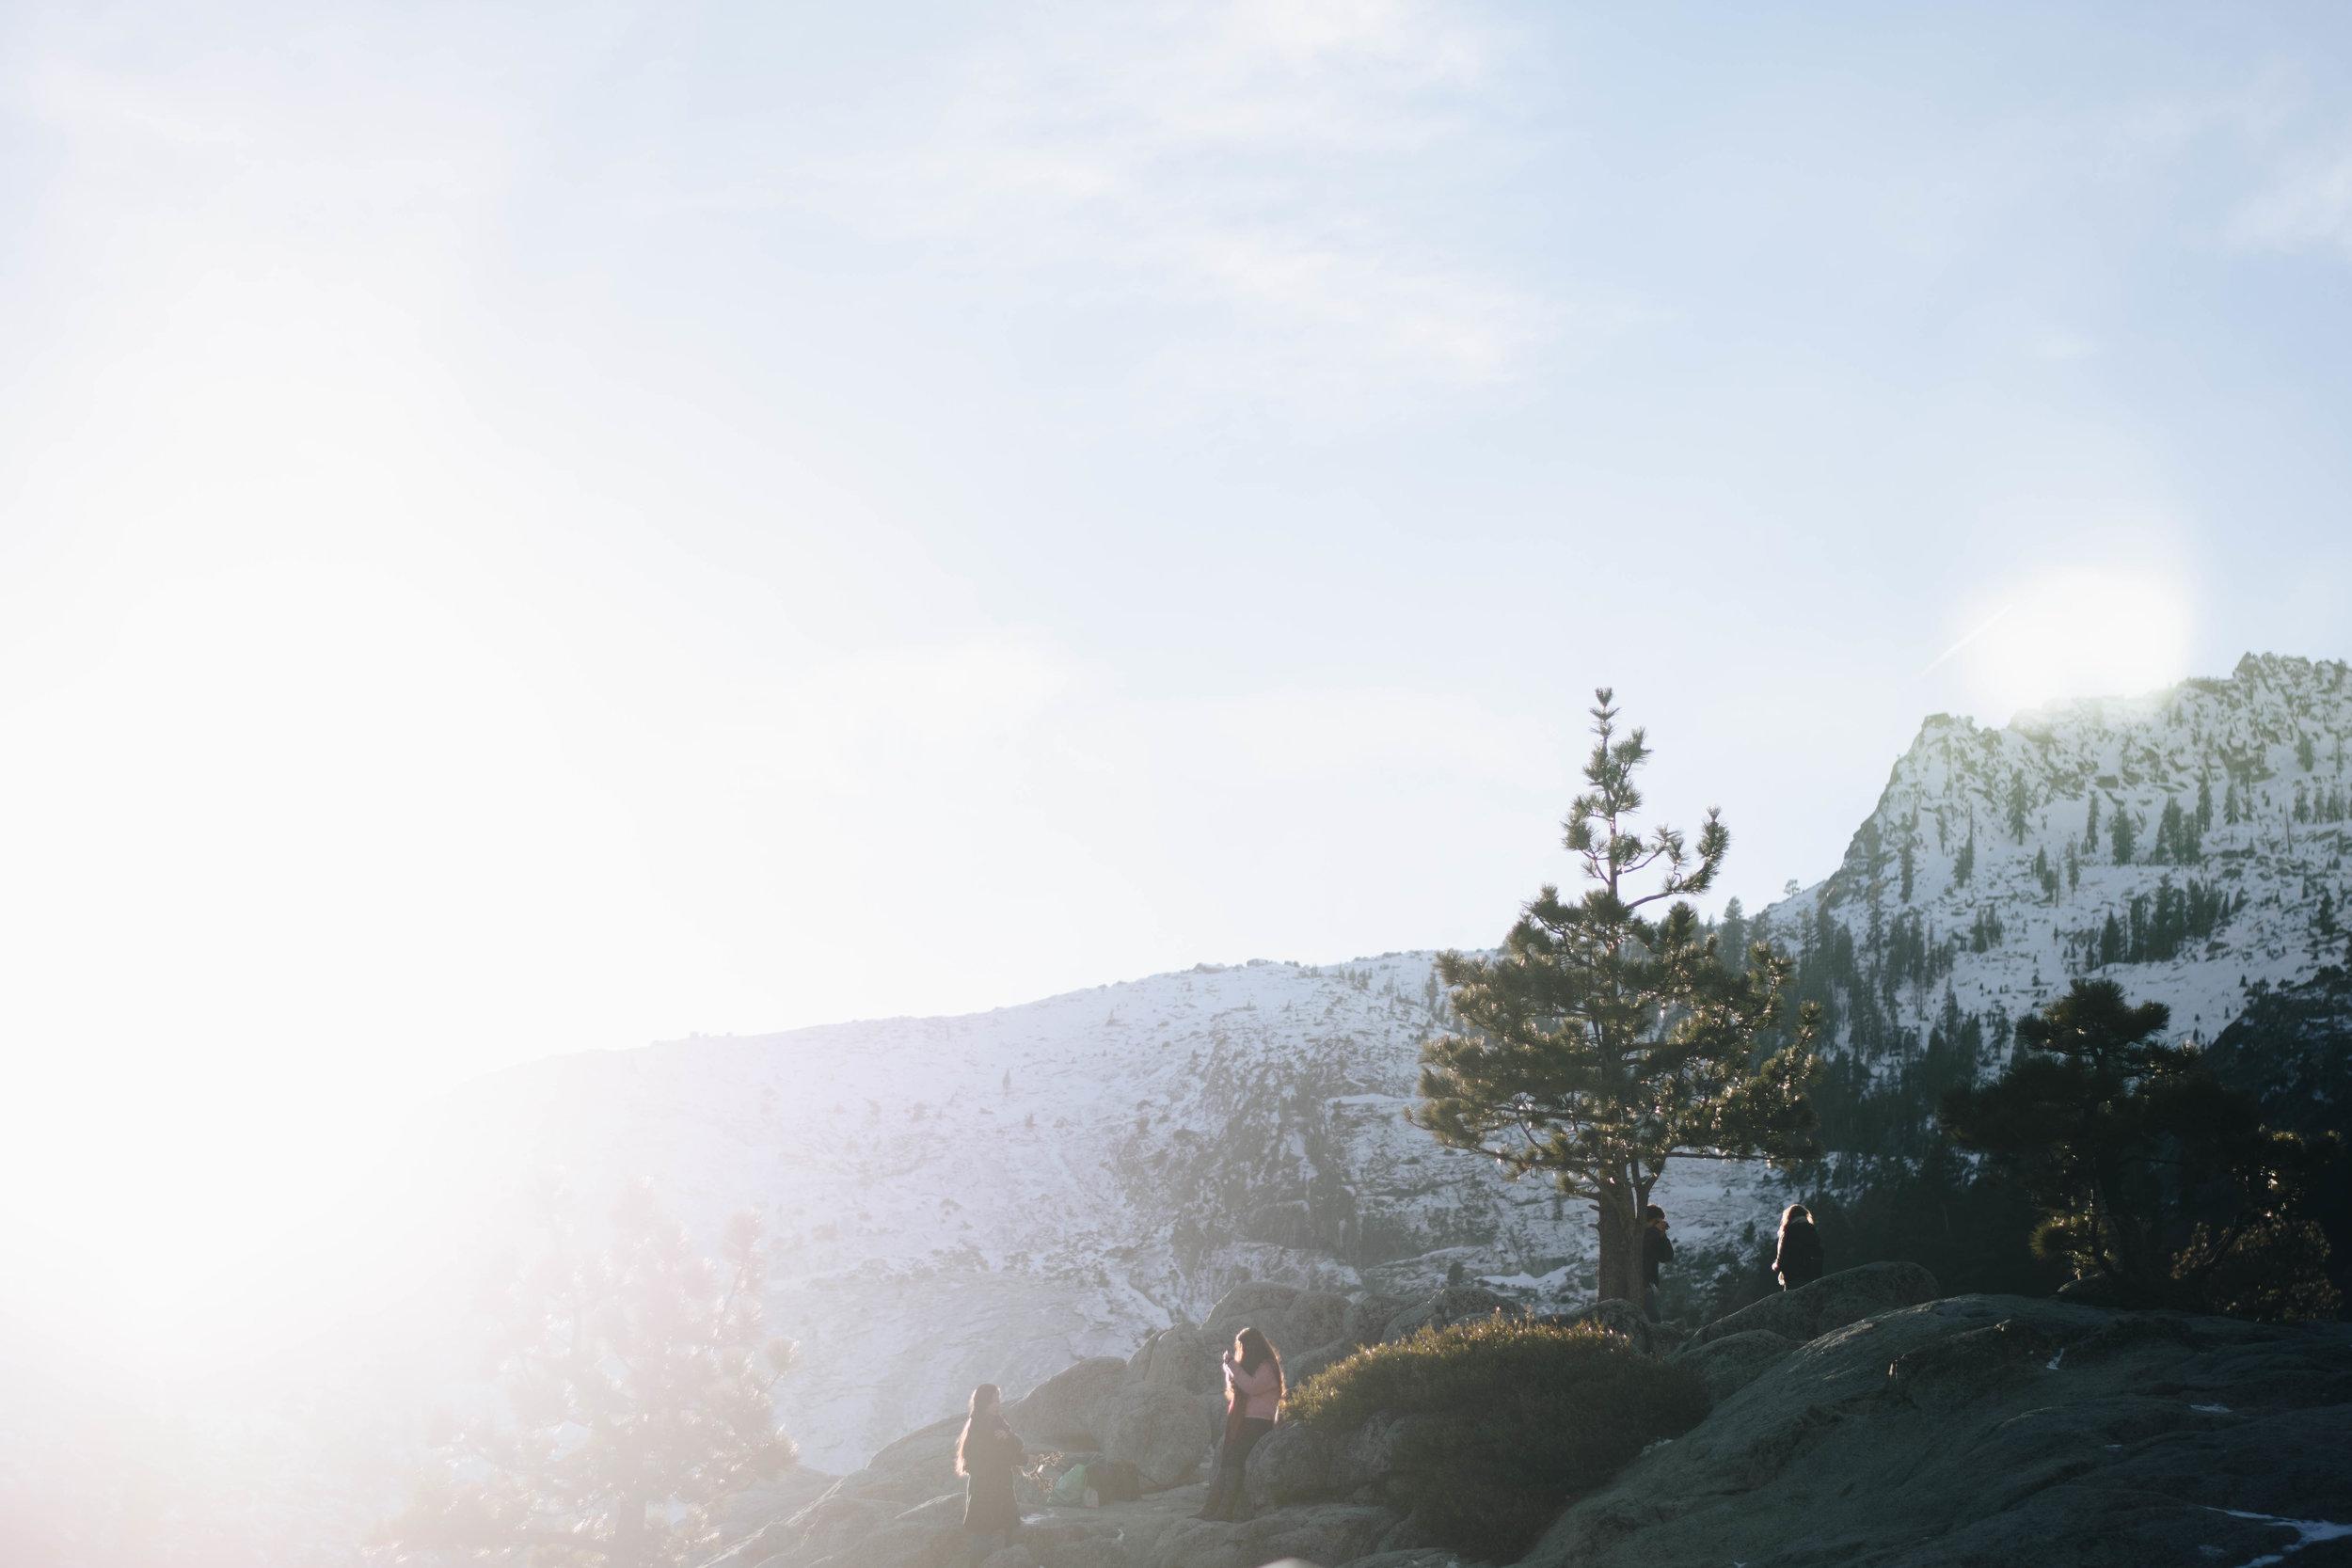 Tahoe Travelers | Lake Tahoe, California | December 17, 2016